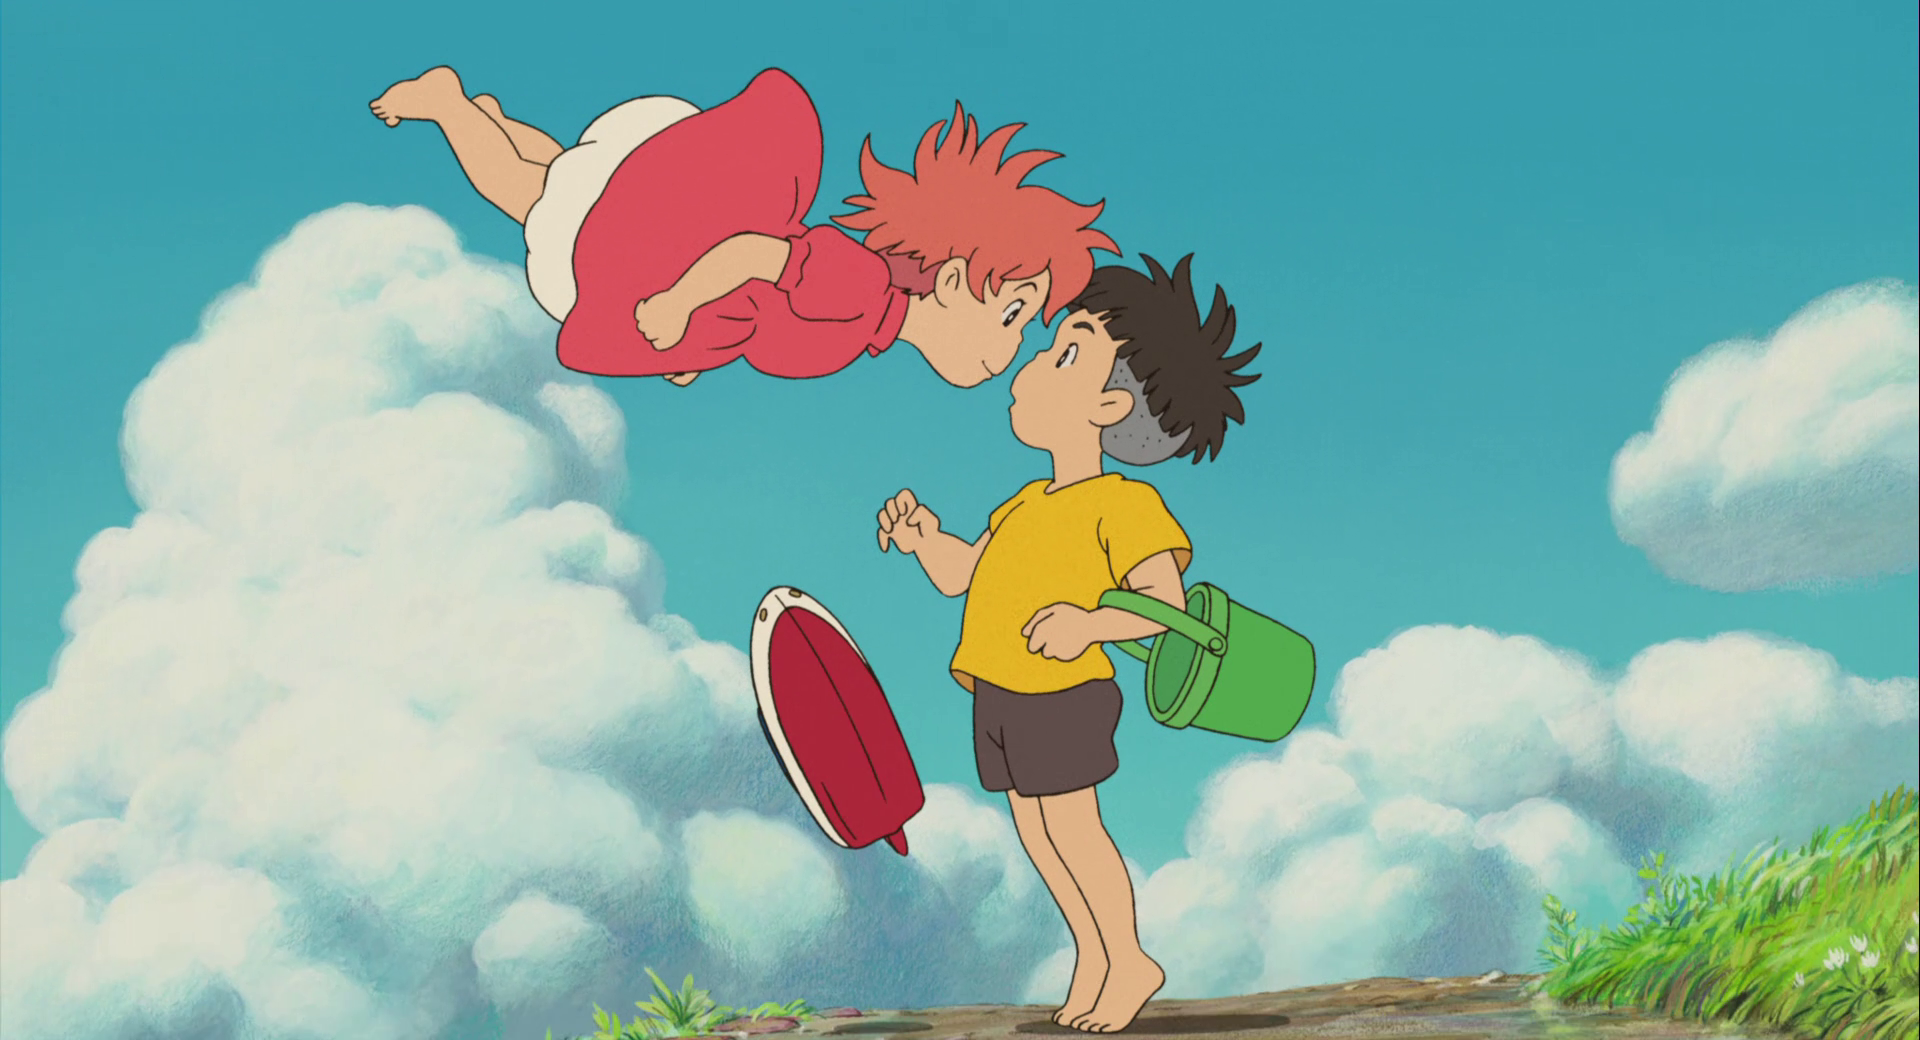 Studio Ghibli Ponyo Wallpapers Top Free Studio Ghibli Ponyo Backgrounds Wallpaperaccess